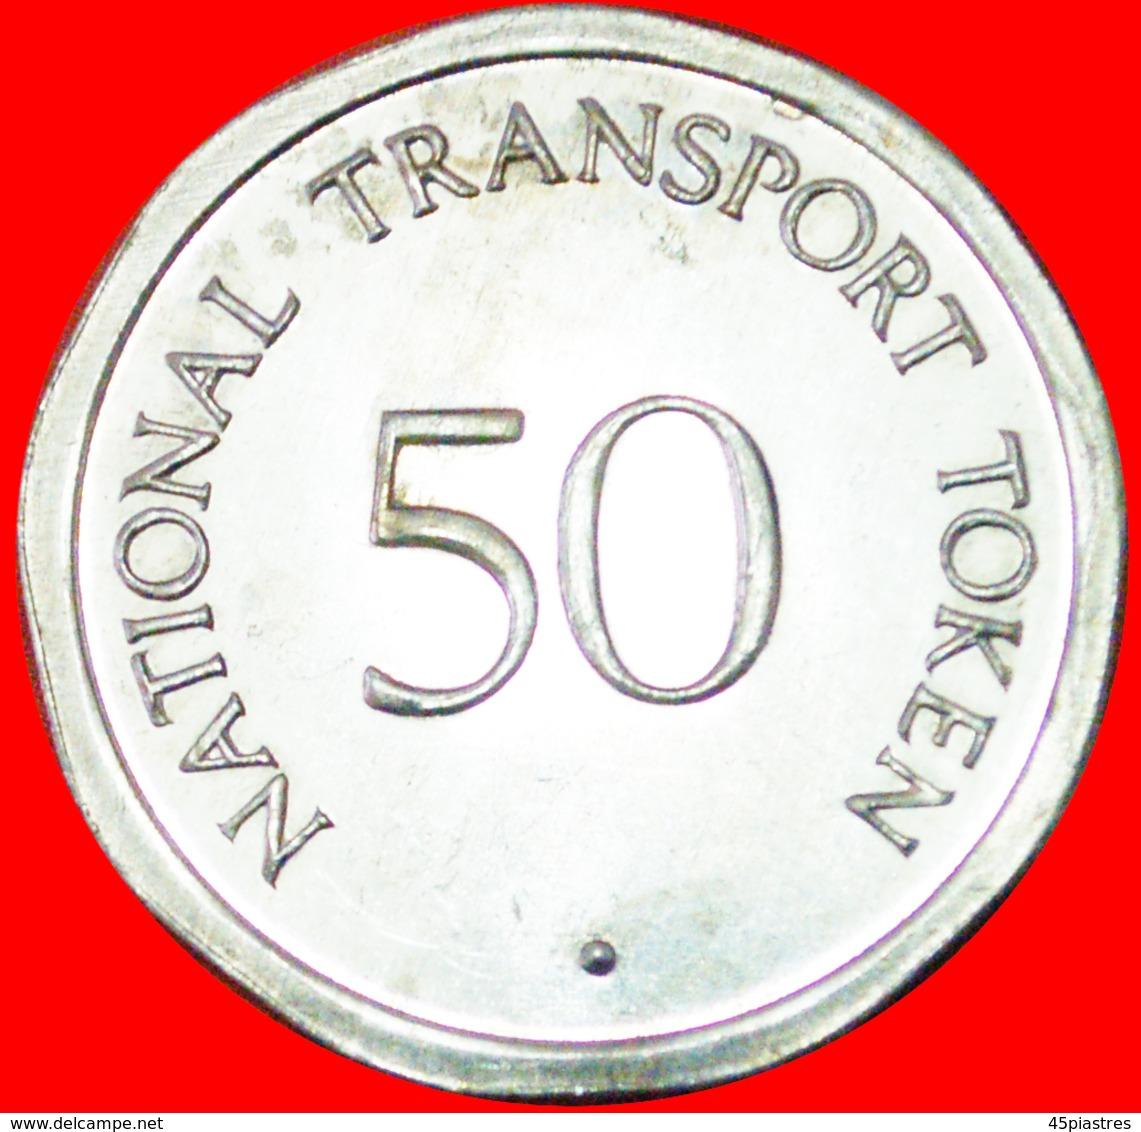 # YORK MINSTER: GREAT BRITAIN ★ 50 PENCE NATIONAL TRANSPORT TOKEN MINT LUSTER! LOW START ★ NO RESERVE! - Professionnels/De Société